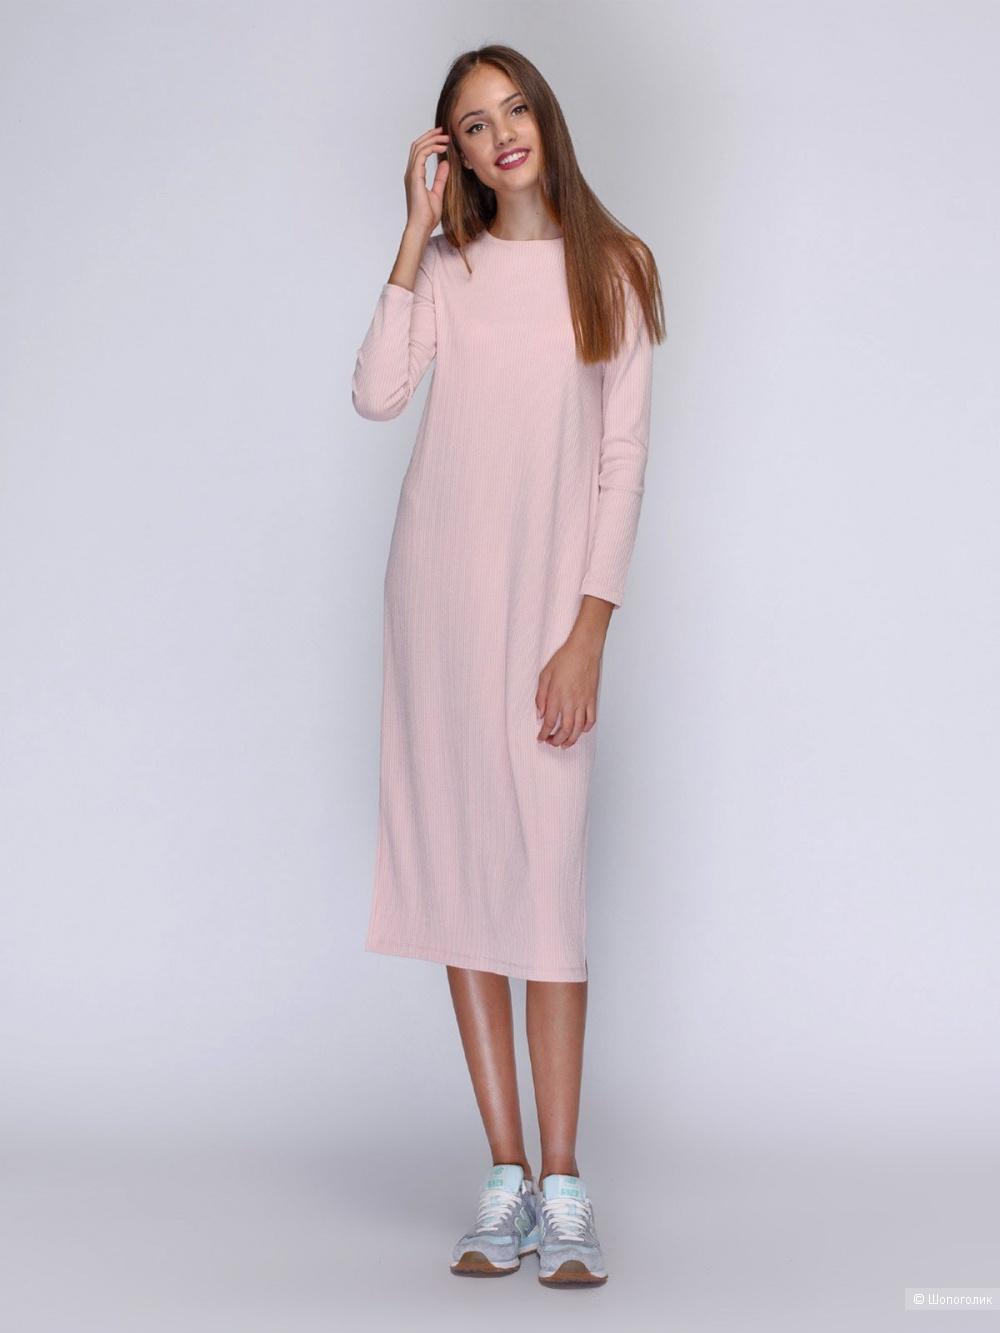 Платье-баллон made in italy, размер 46